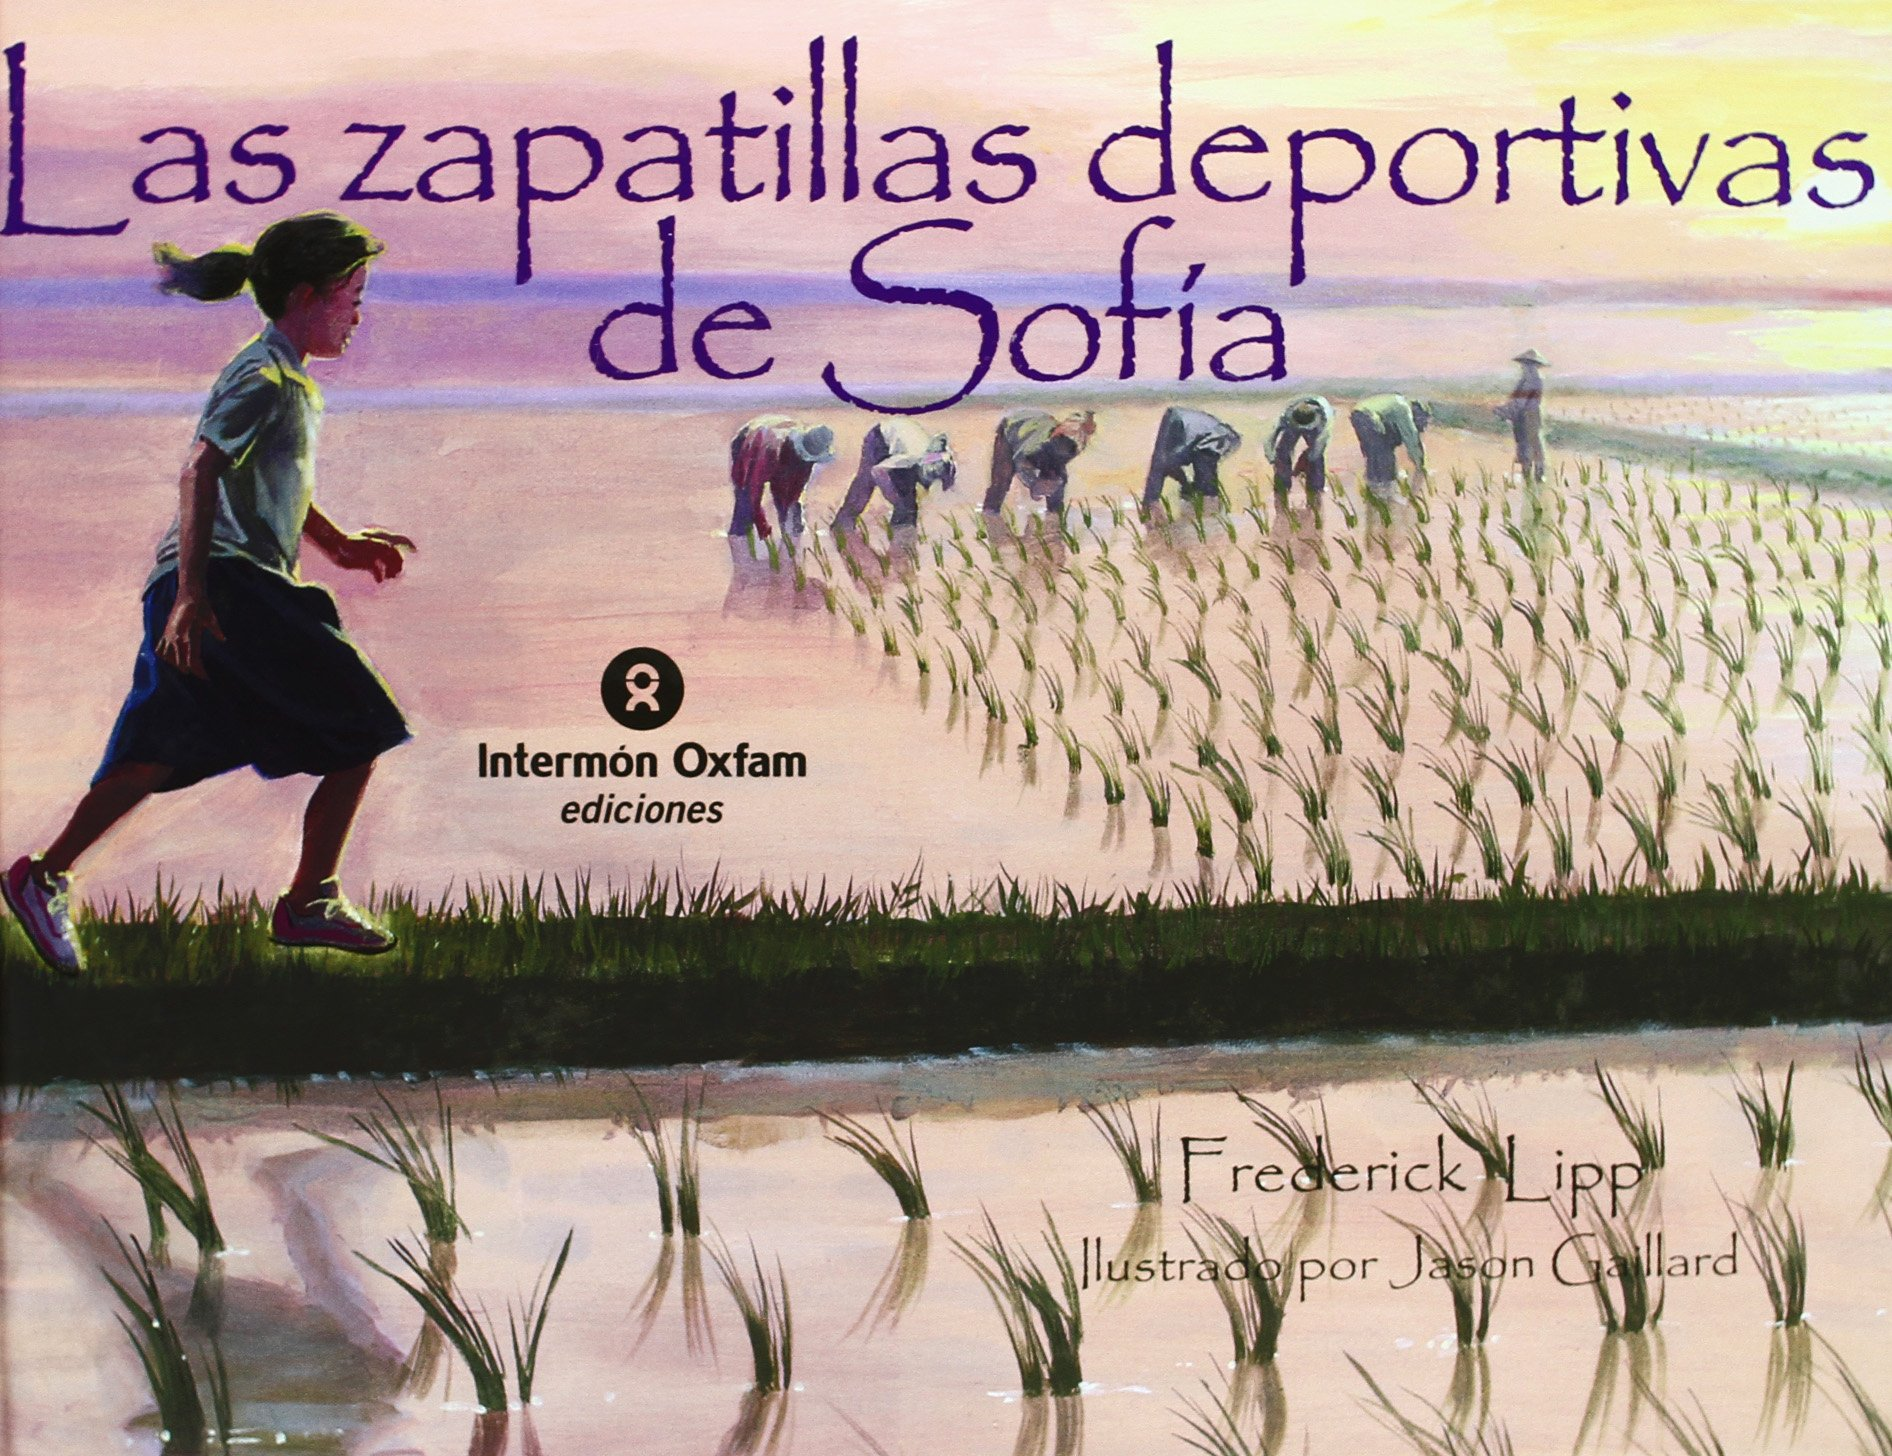 Las zapatillas deportivas de Sofia / Running Shoes (Spanish Edition) (Spanish) Hardcover – September 7, 2007